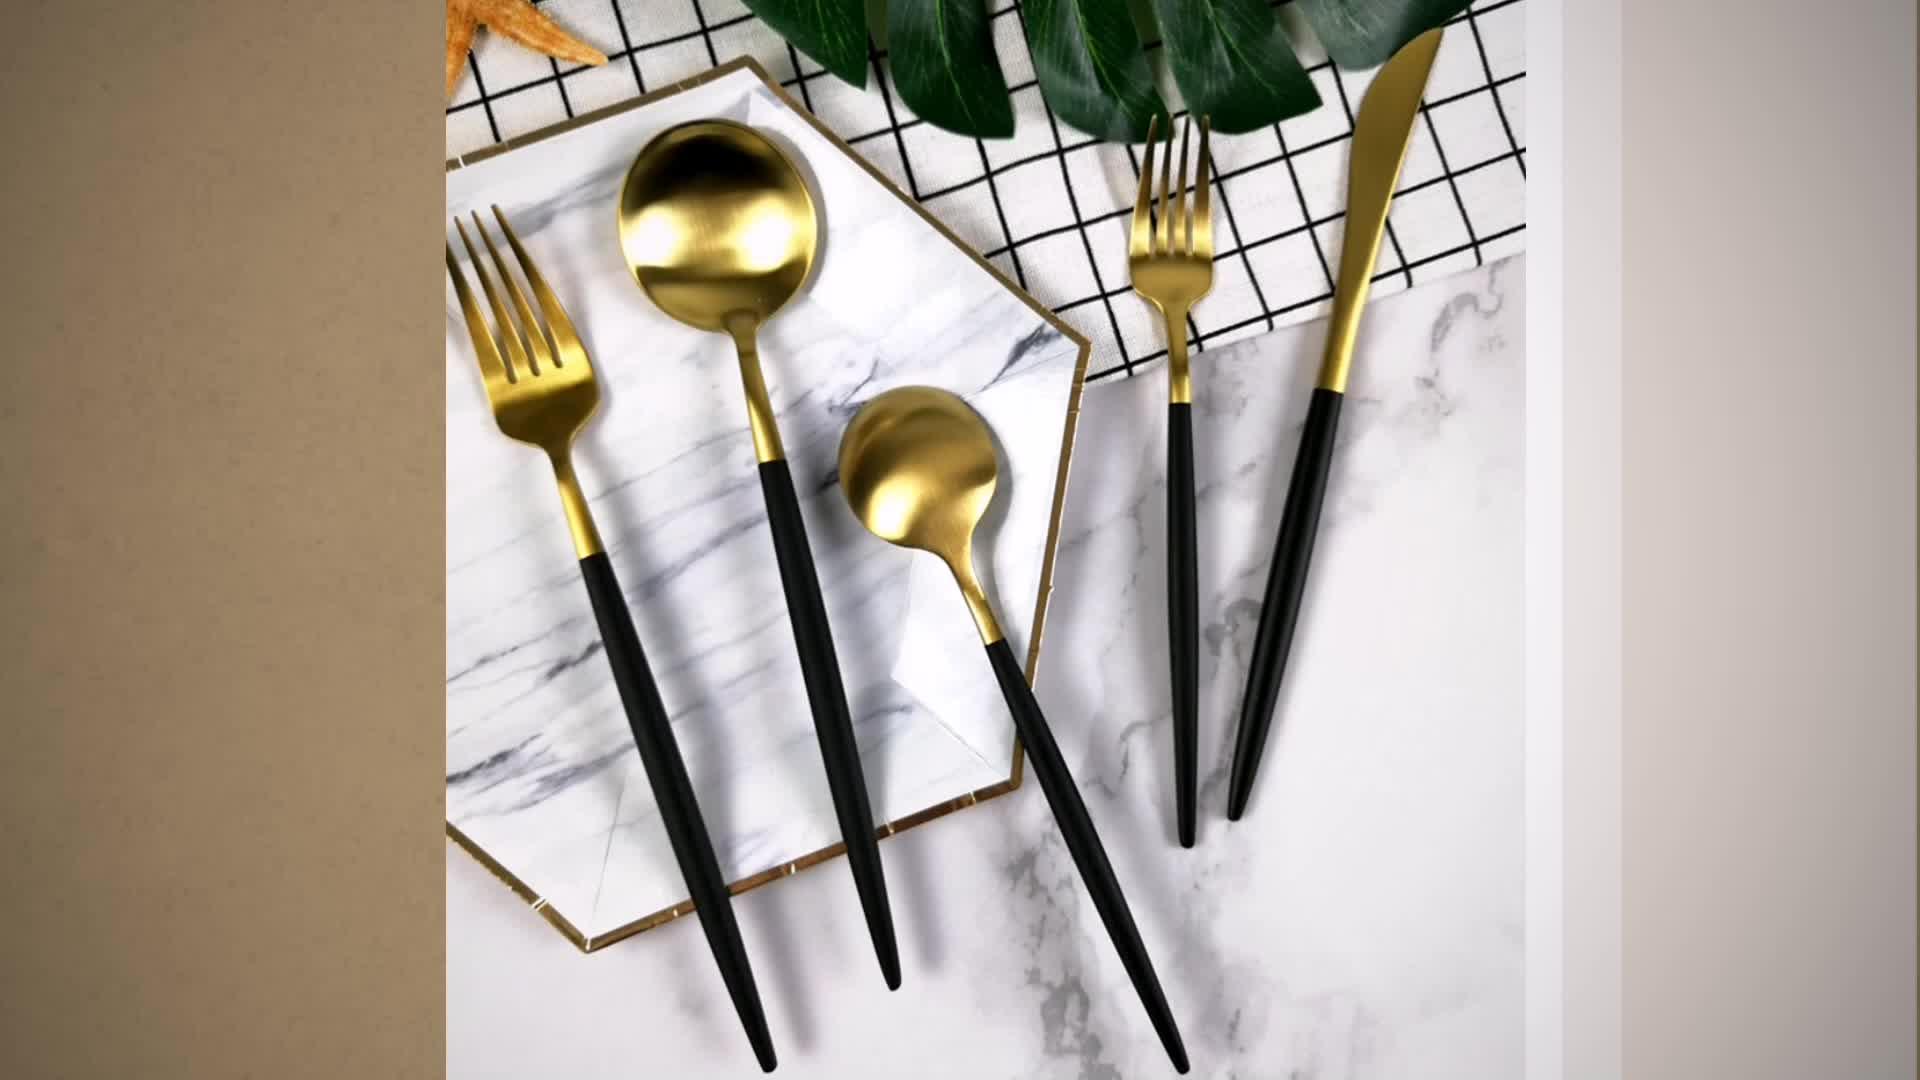 Black Handle and Gold Plated hotel Cutlery Matte golden flatware sets buffet brass copper utensils for Kitchen wedding rental